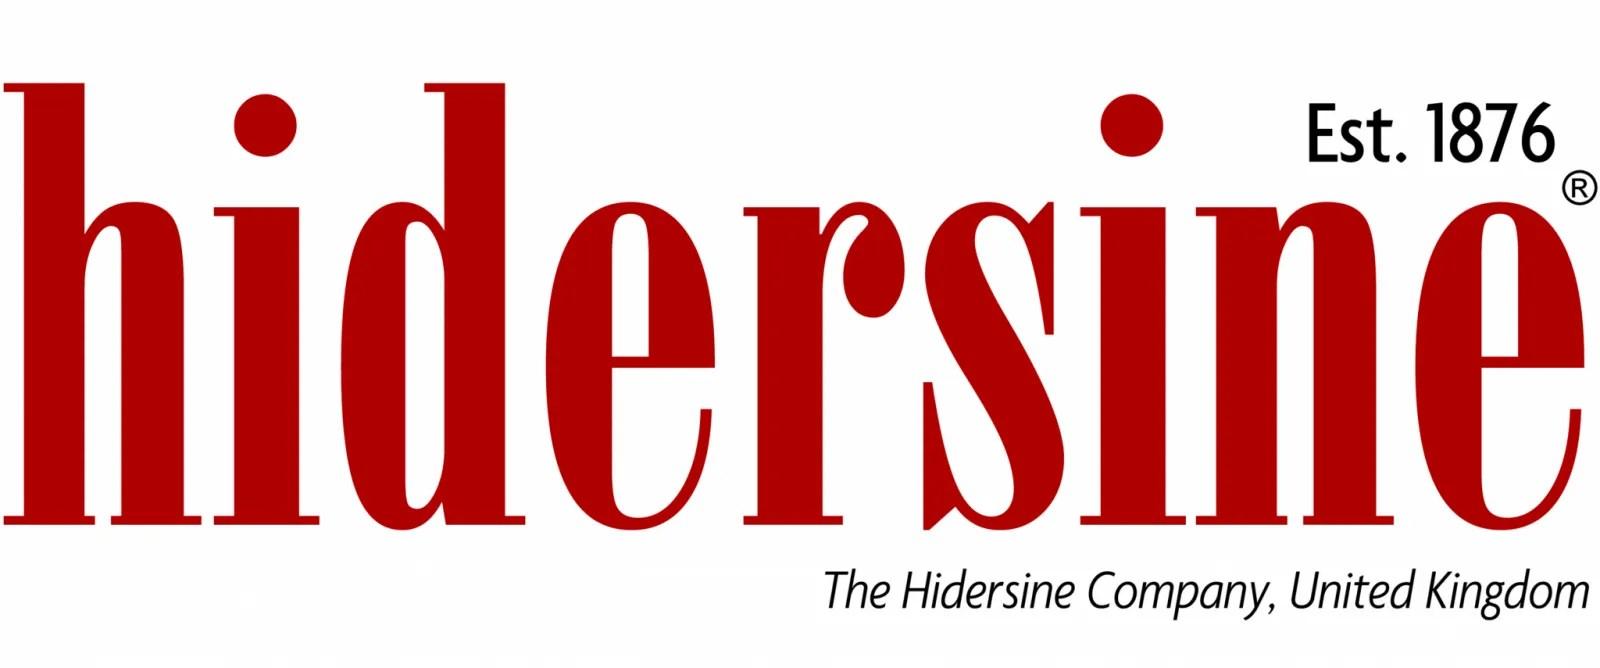 Hidersine logo